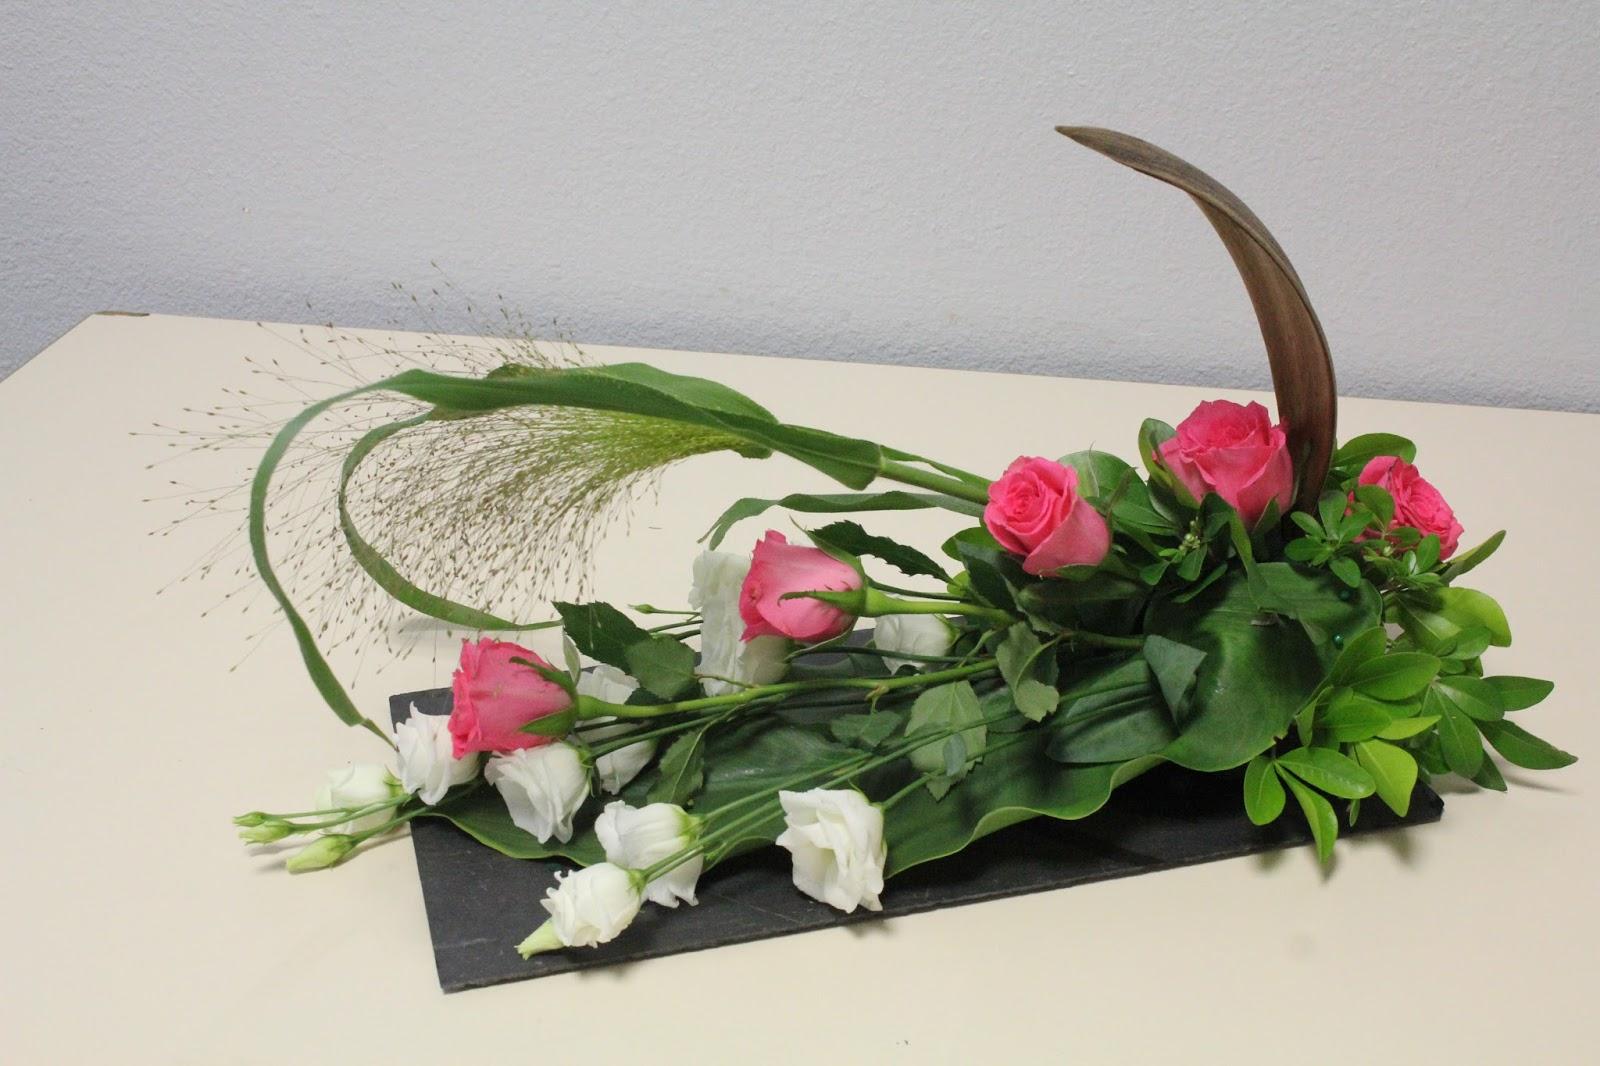 art floral breal bouquet cascade. Black Bedroom Furniture Sets. Home Design Ideas